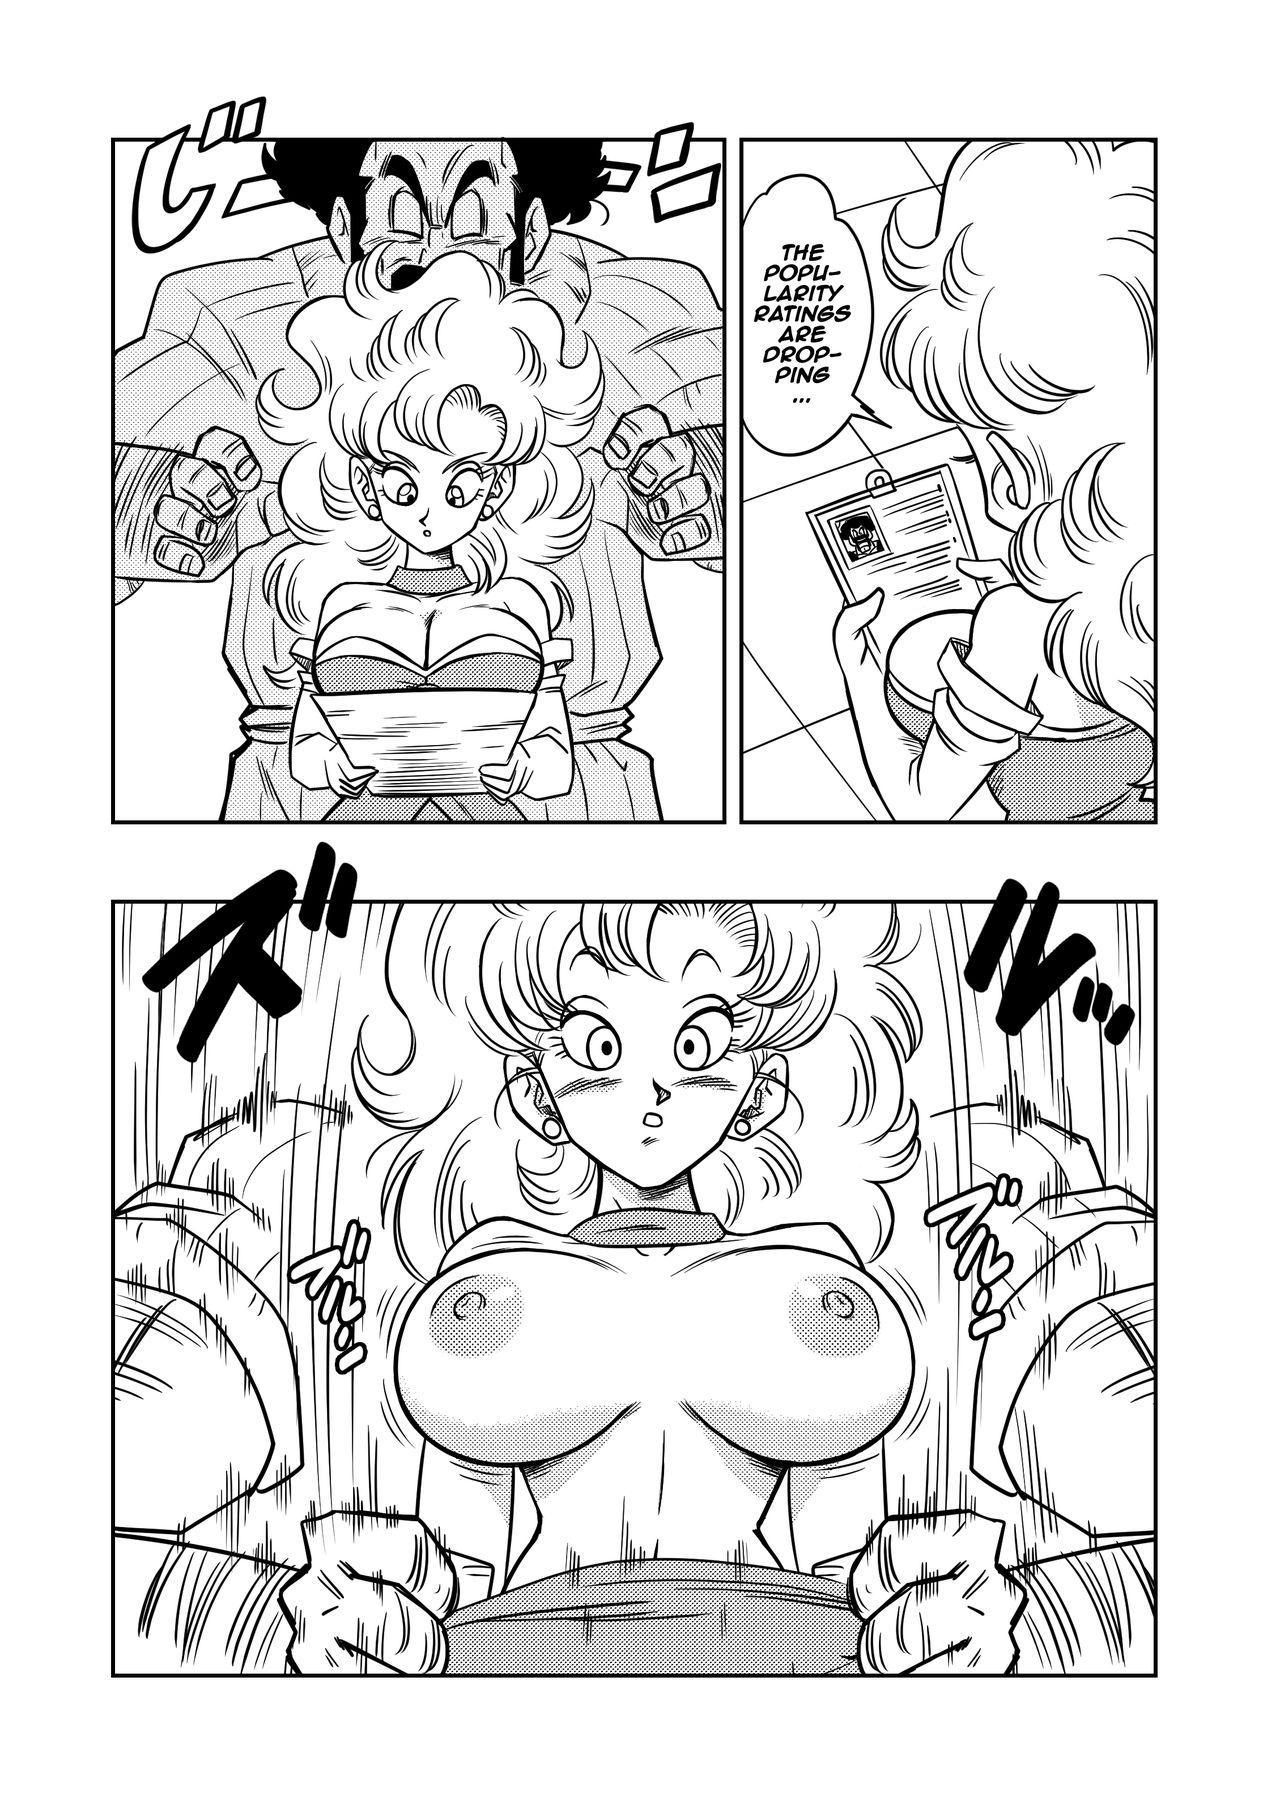 Mister Satan no Himitsu no Training | Mr. Satan's Secret Training 4